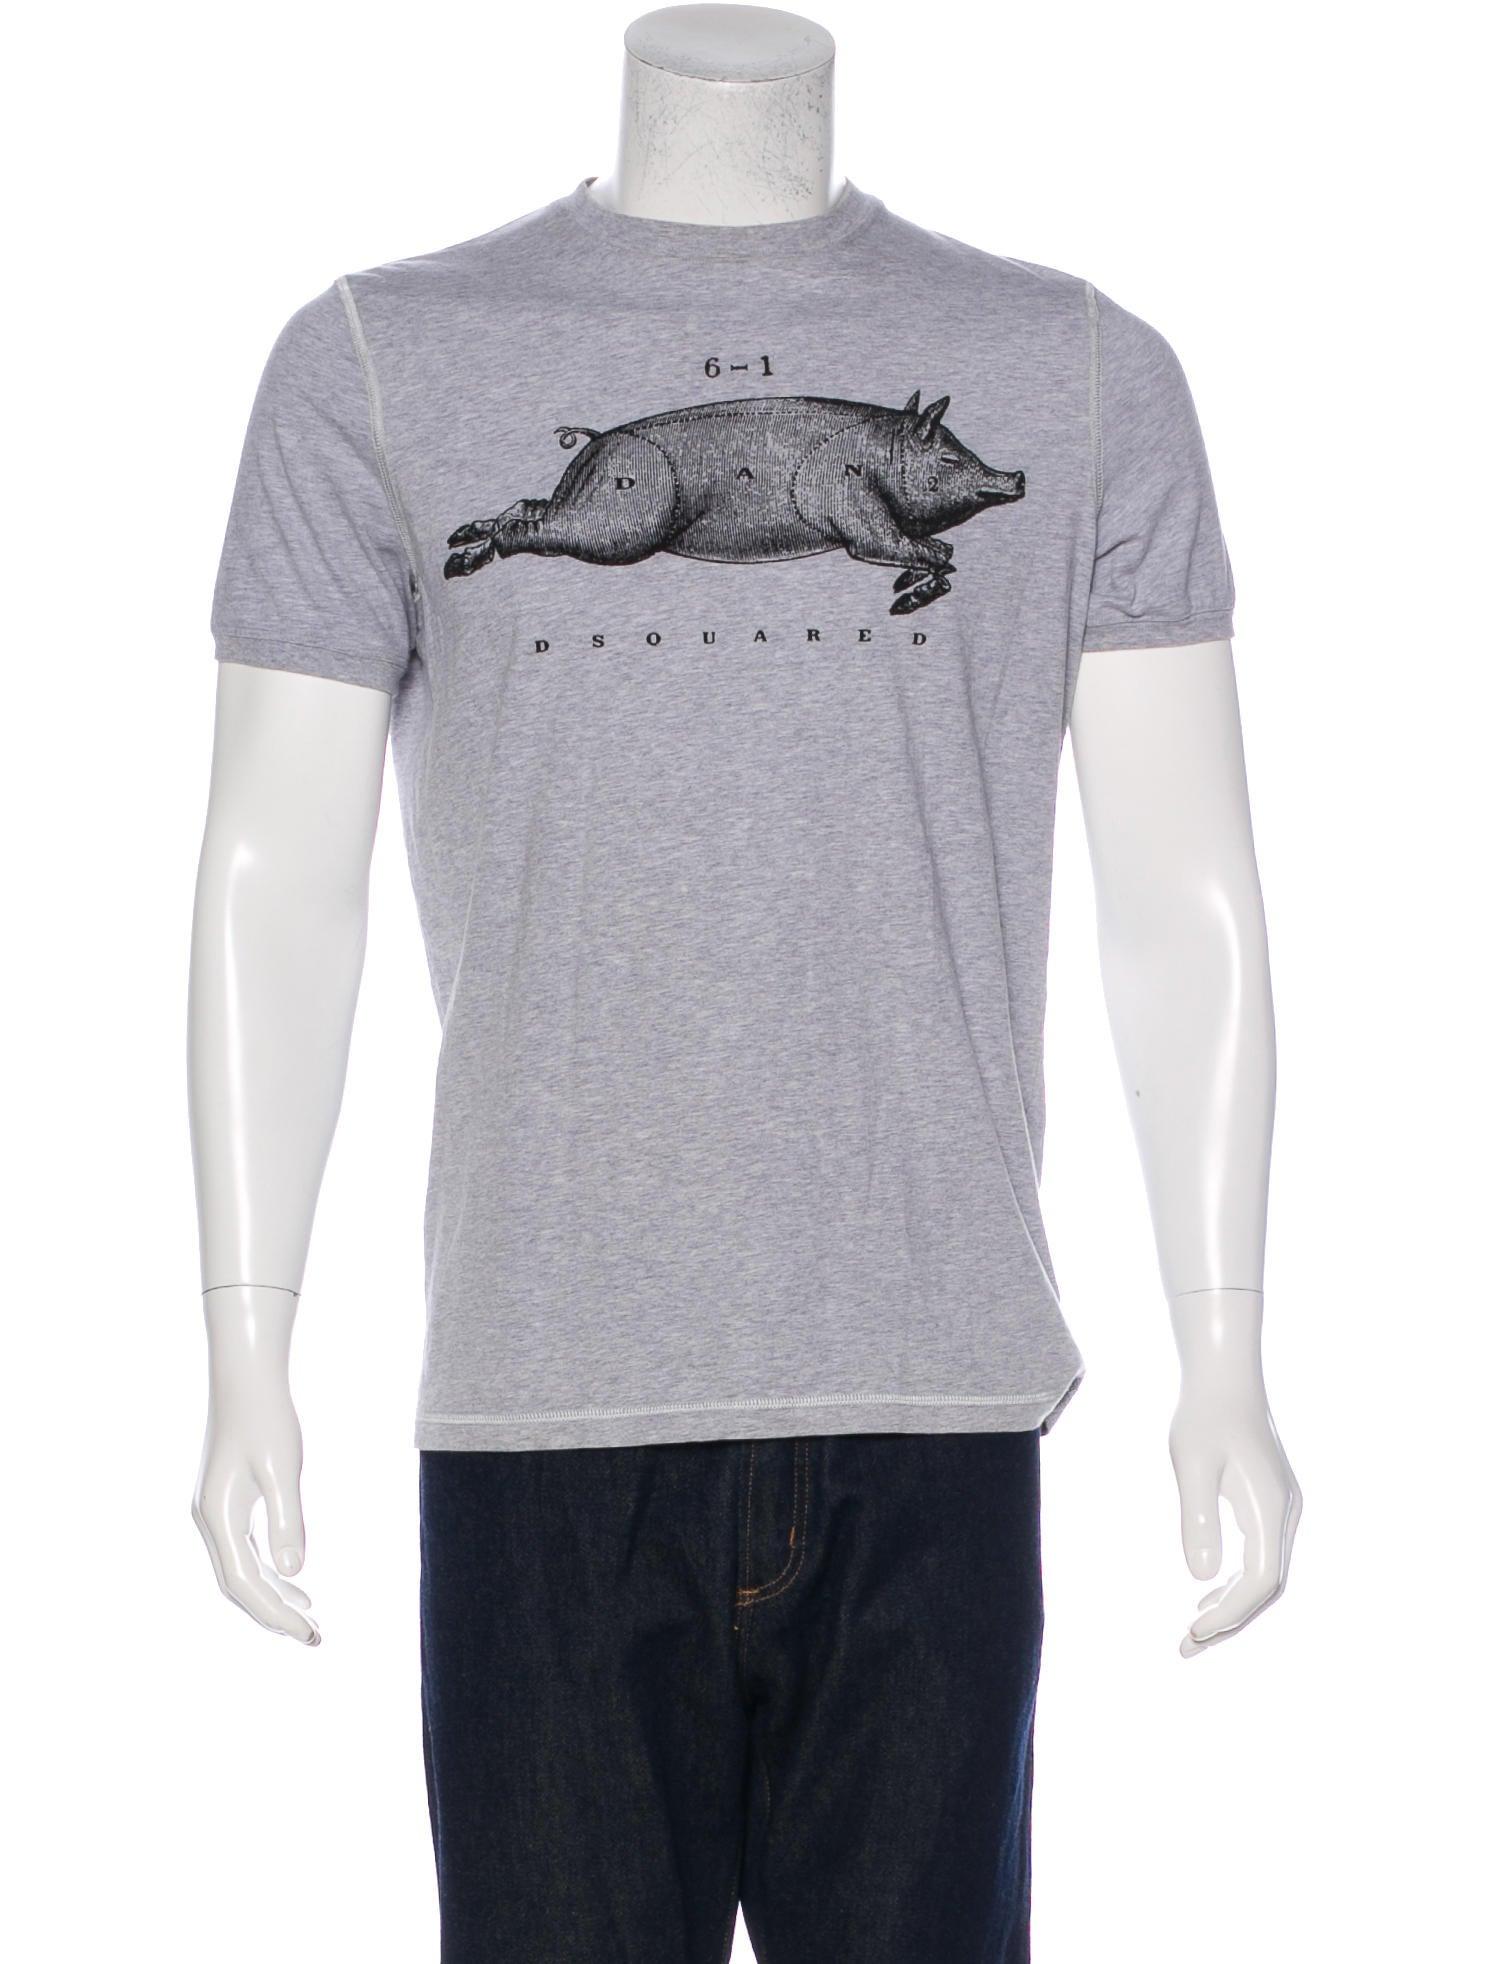 products s e original men designs urbanhero shirt type t jaguar mens shirts image by